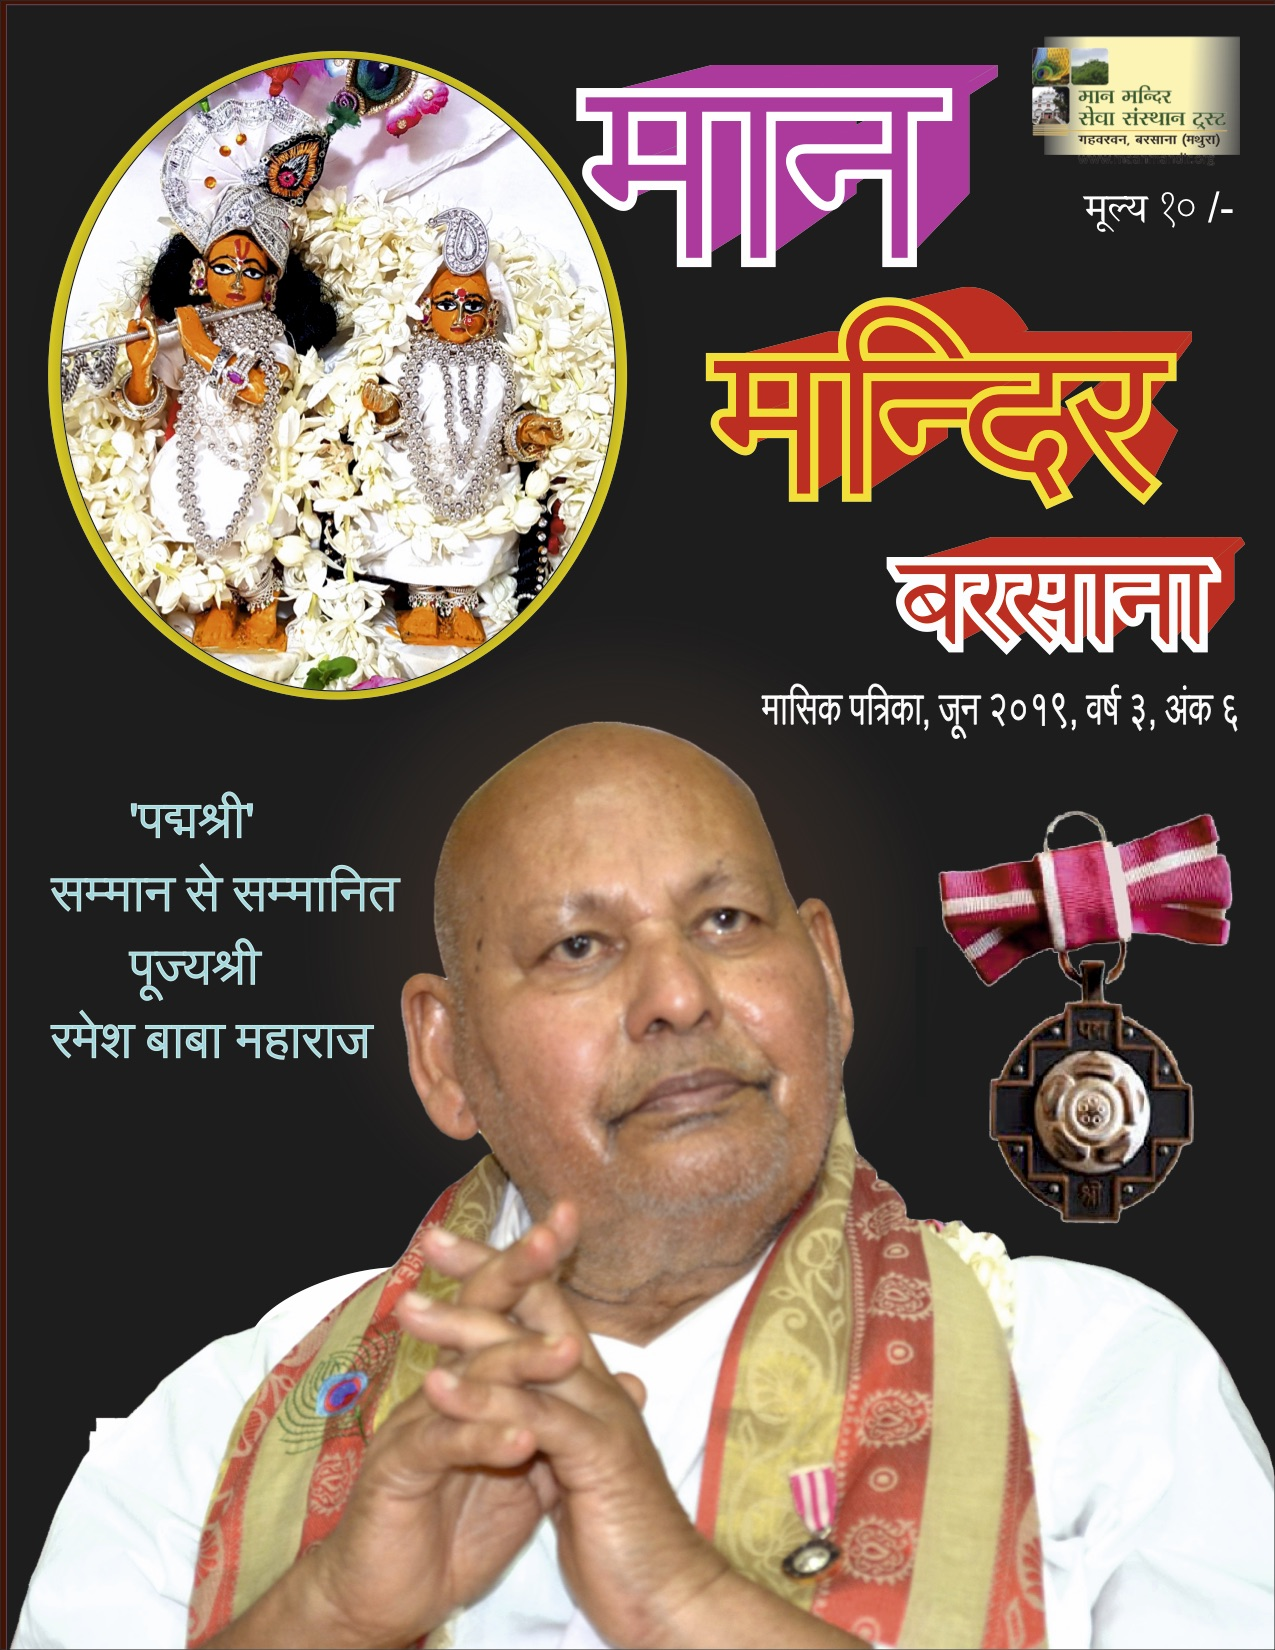 Maan Mandir Patrika – June 2019